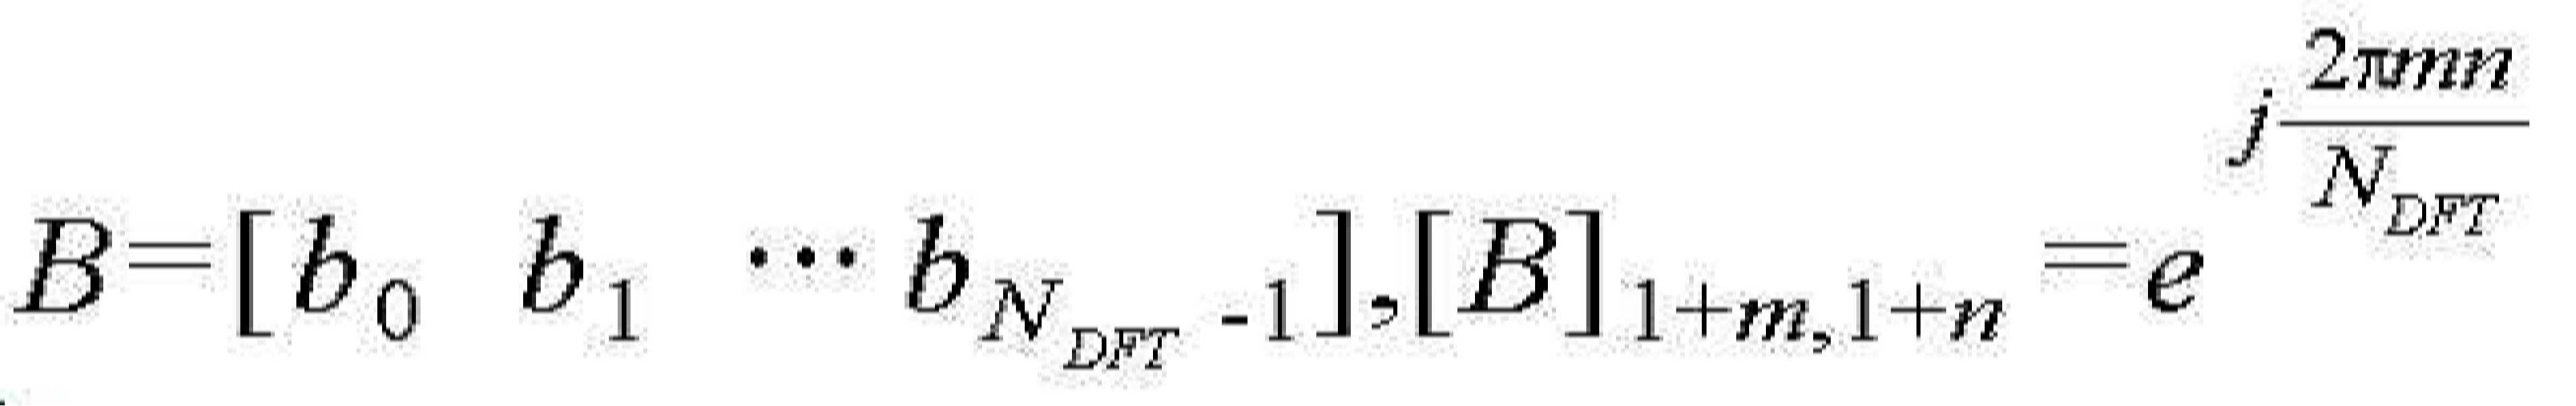 Figure 112019051199313-pct00072